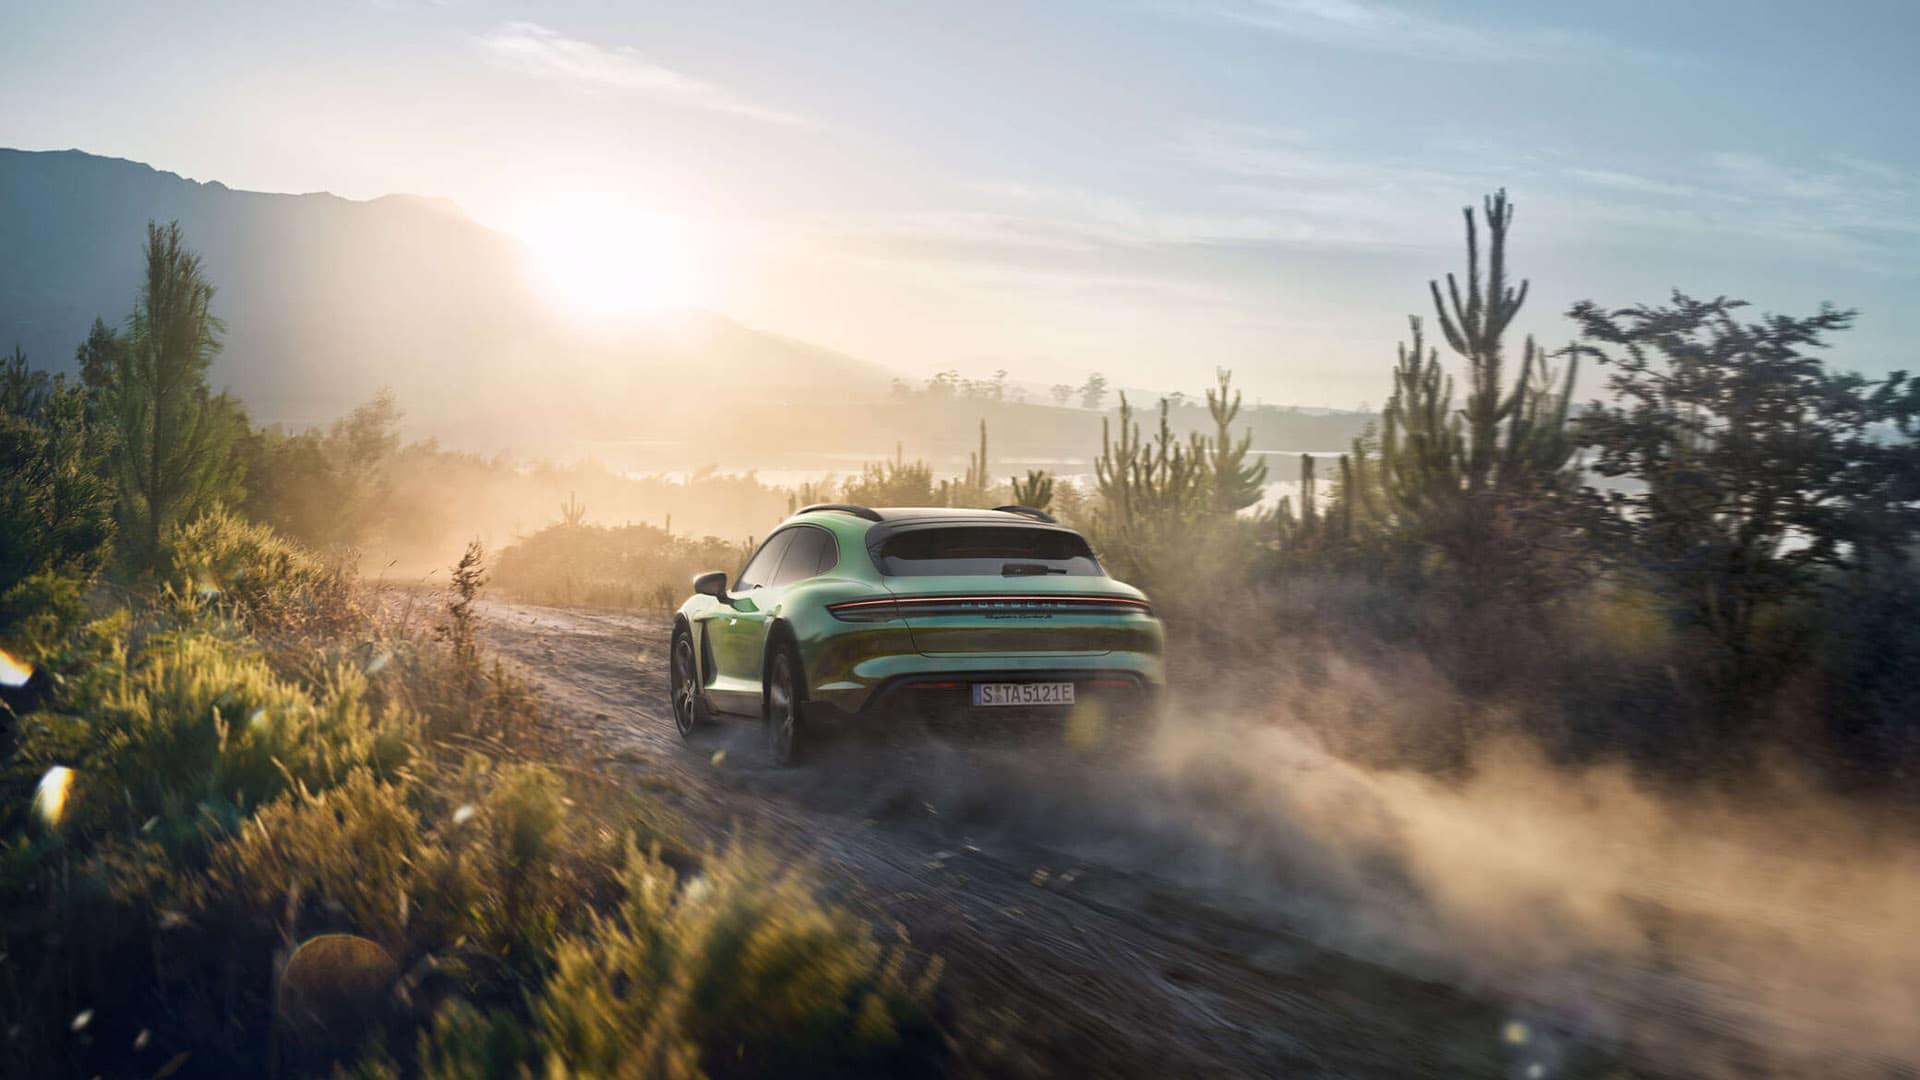 Taycan Turbo S Cross Turismo off road in a desert landscape.